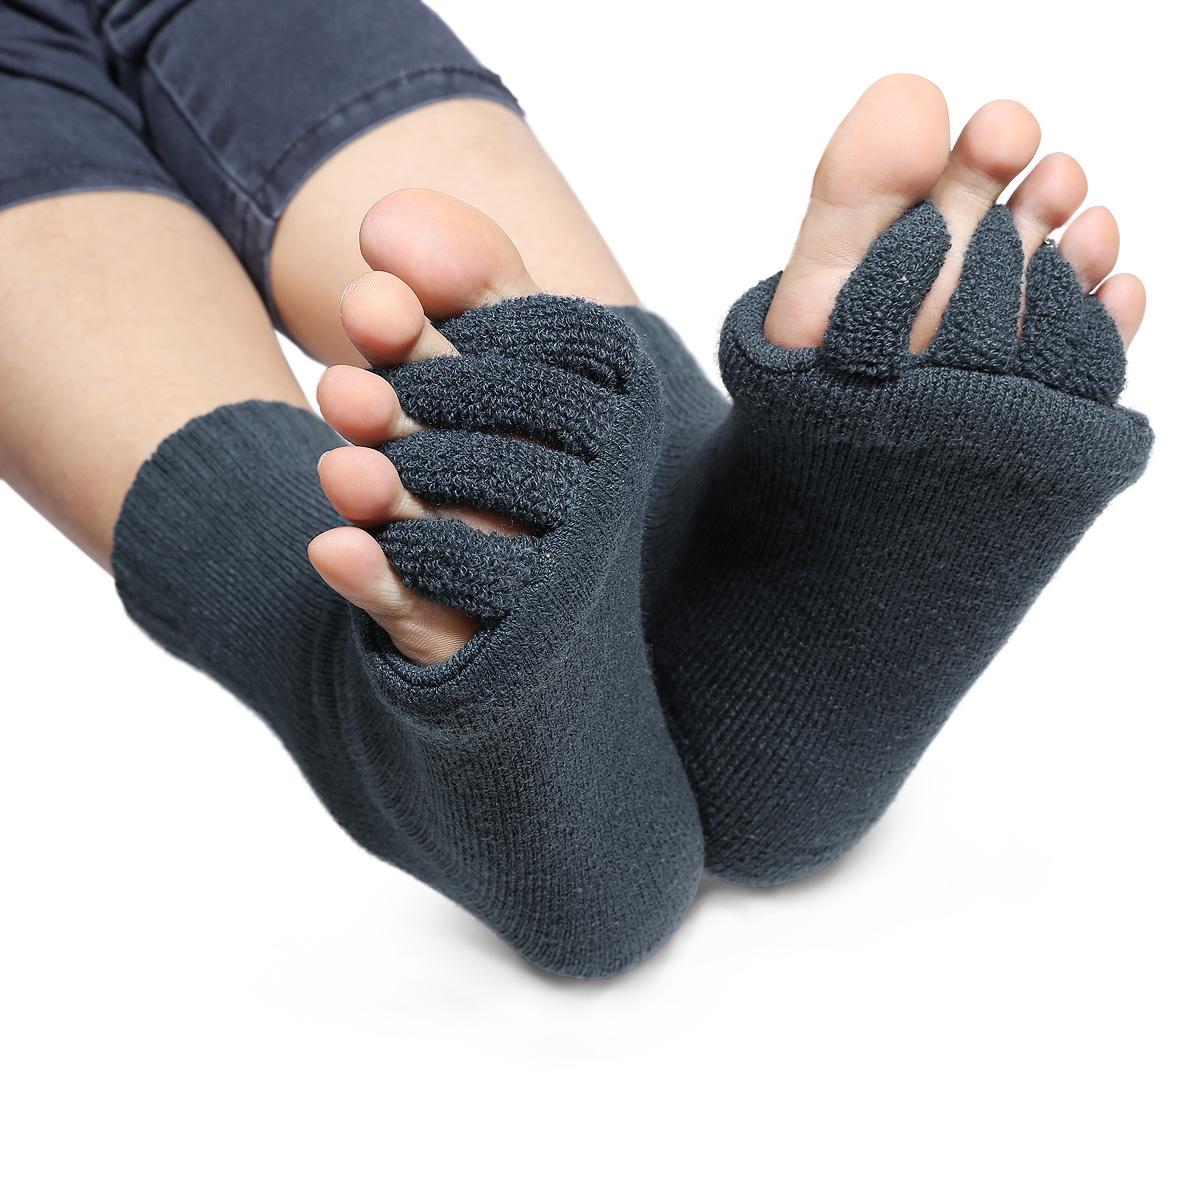 Yoga Sports Massage Toe Socks Five Toe Separator Foot Alignment Pain Relief